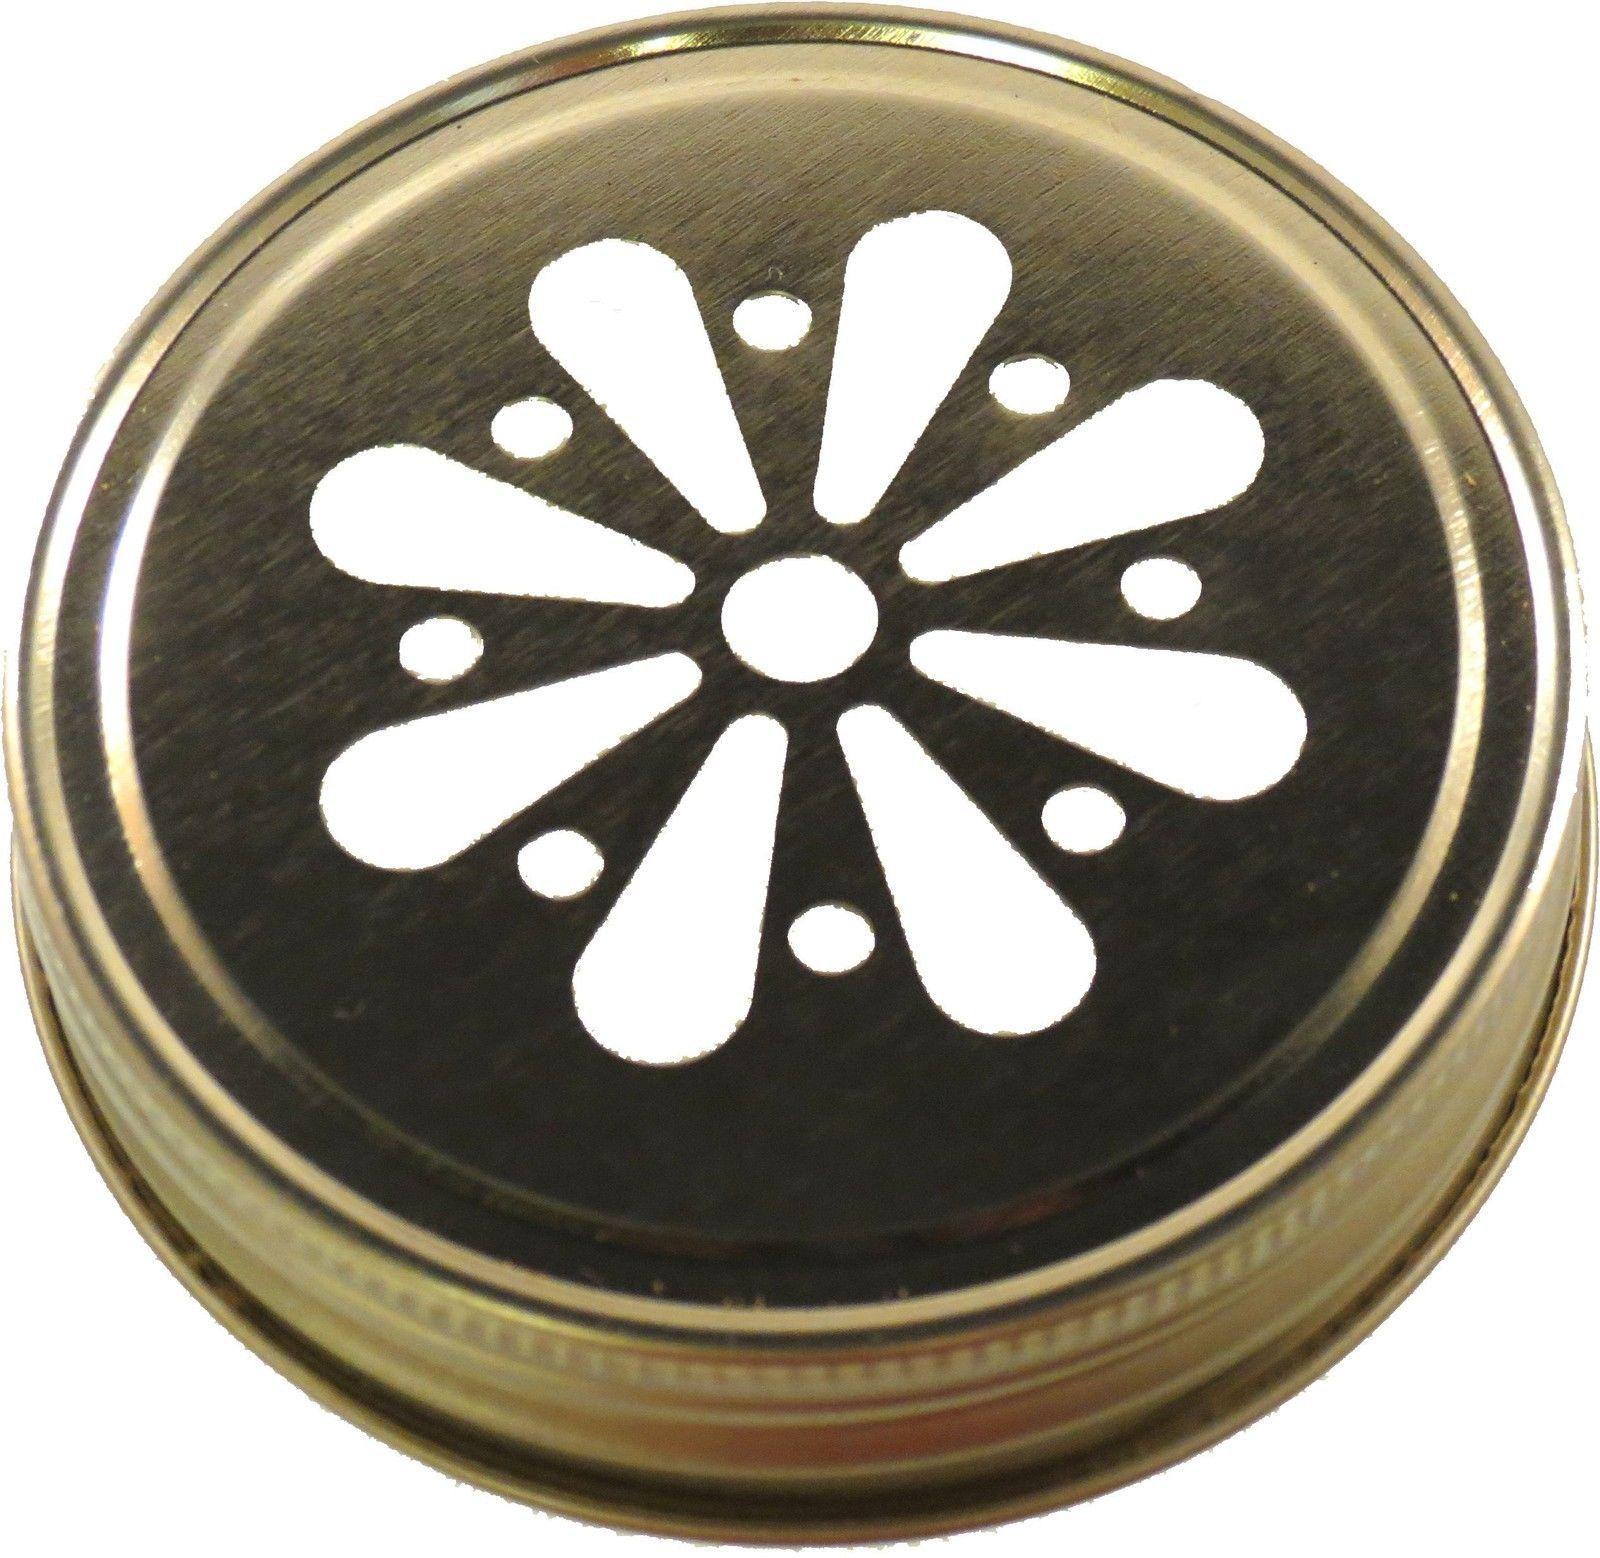 Baby Powder Smelly Jelly, Room Air Freshener, 8 oz